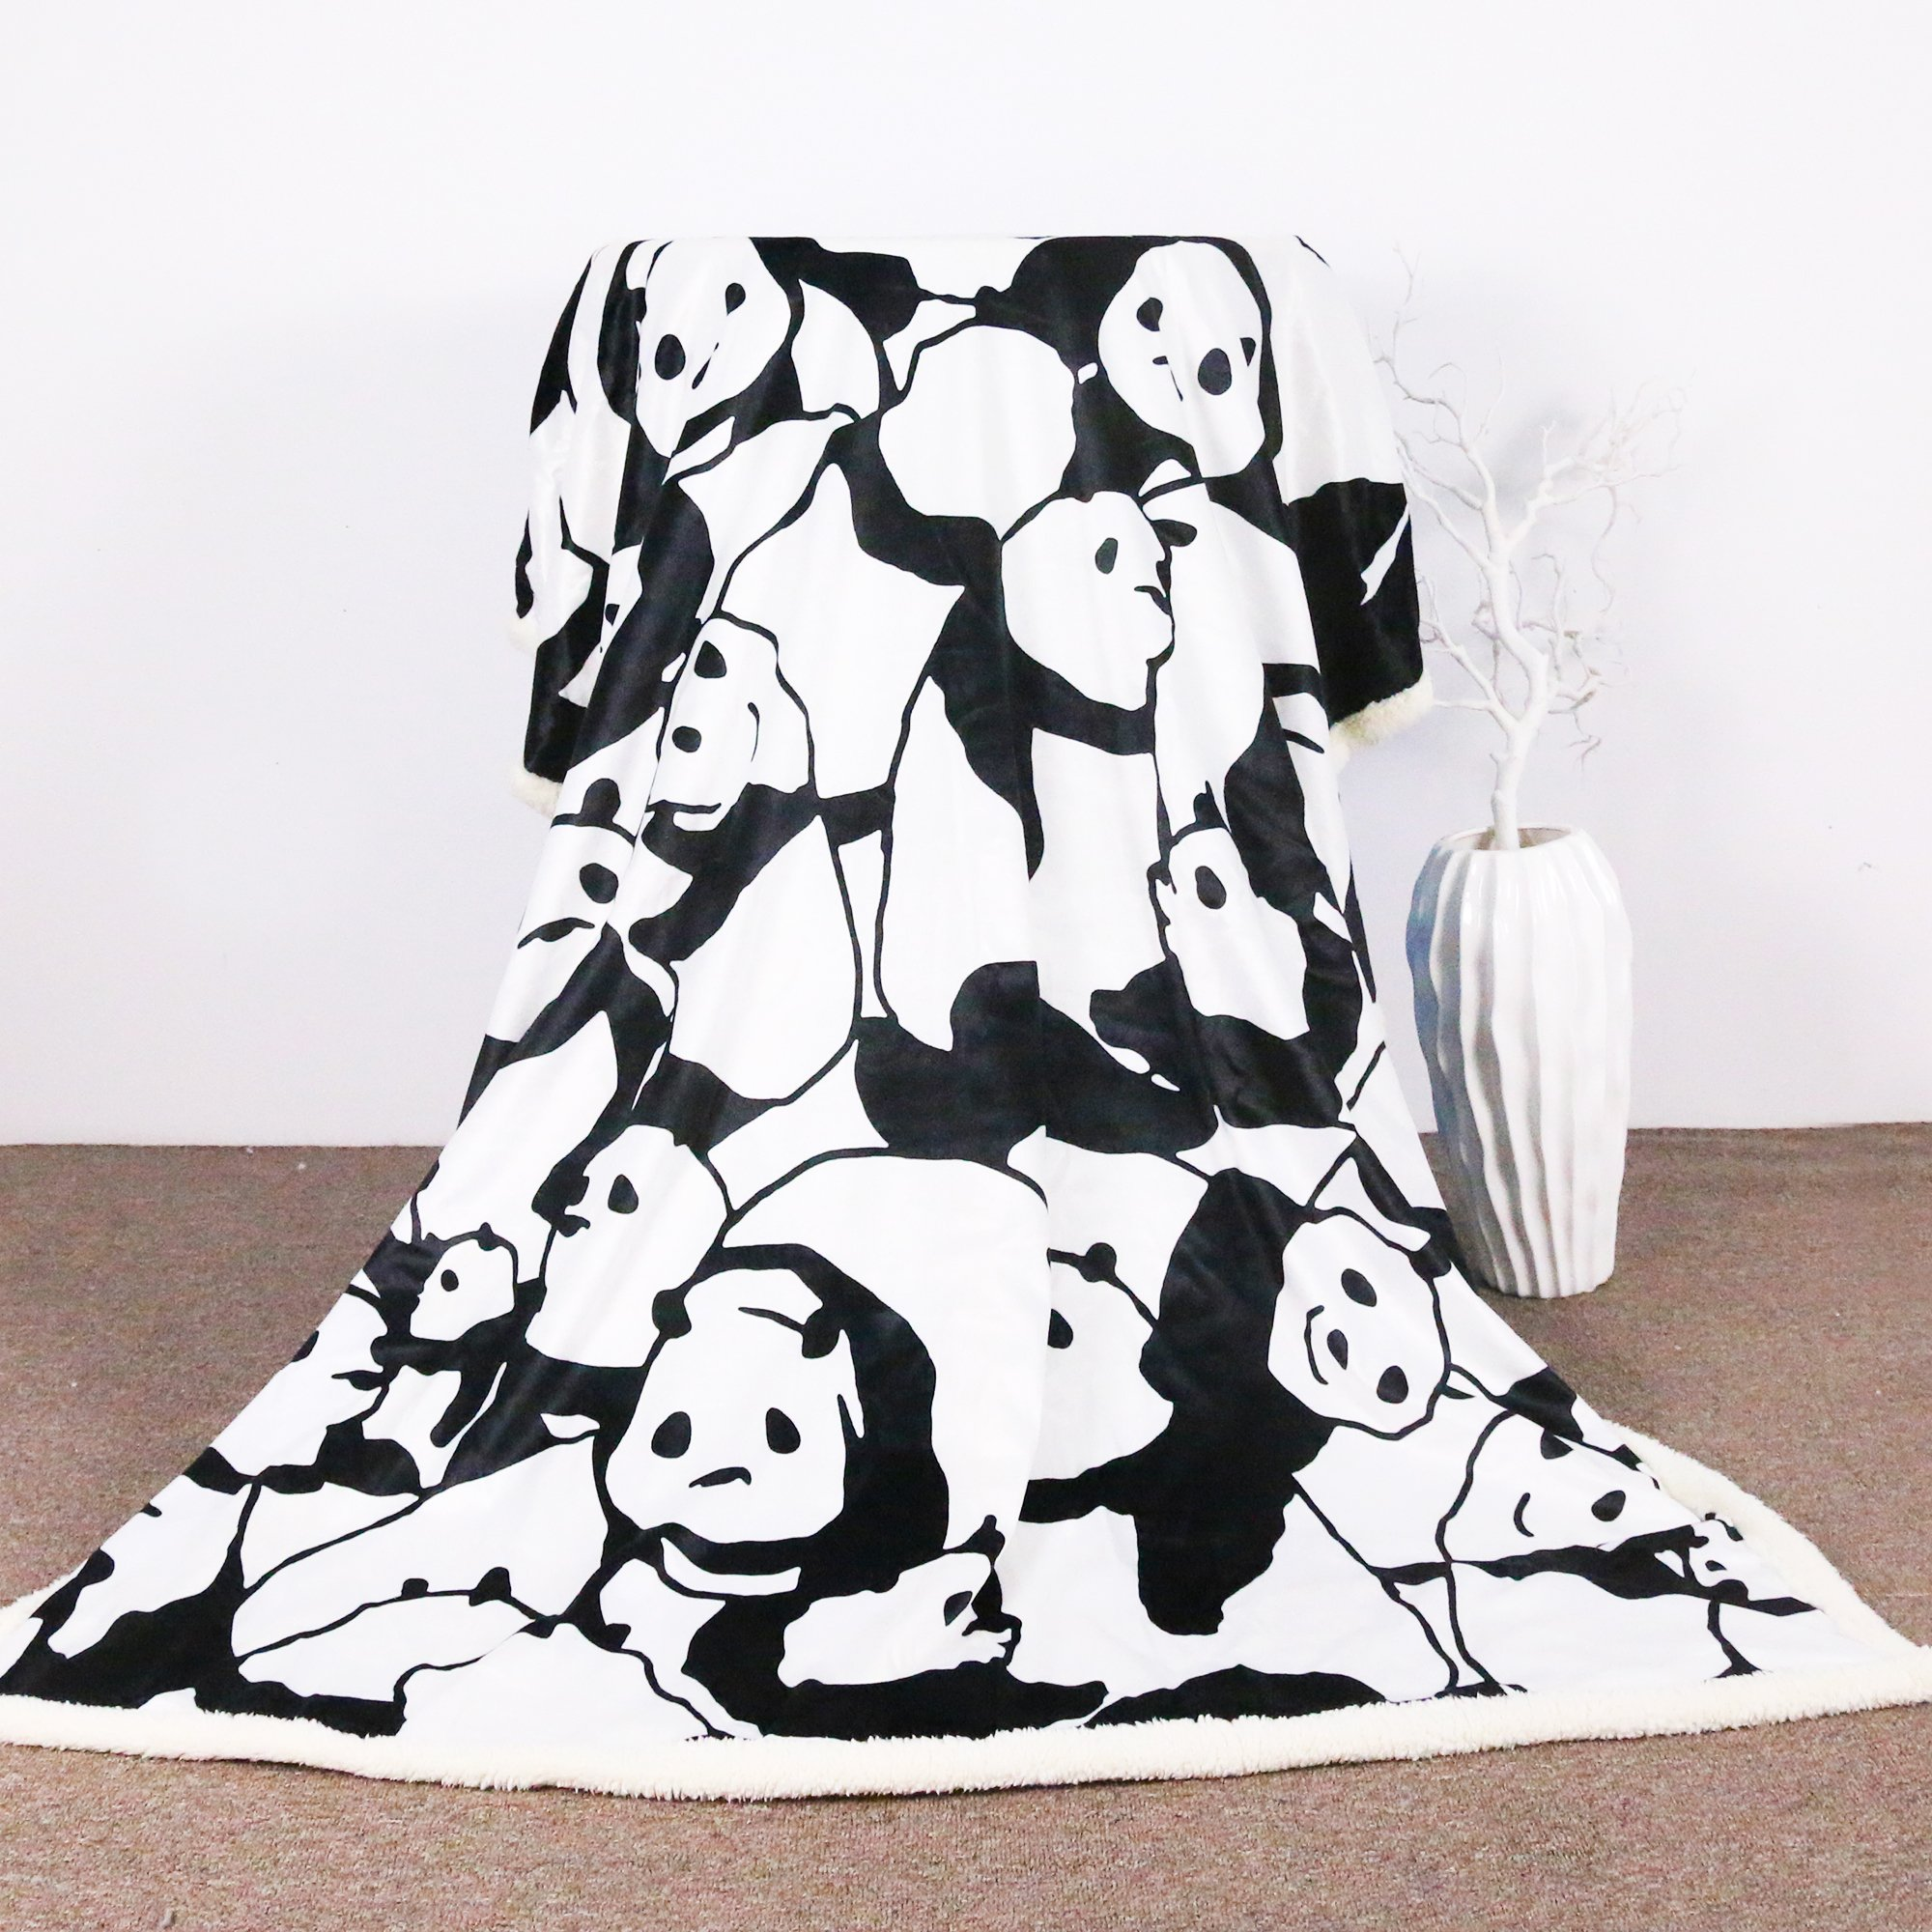 Sleepwish Panda Plush Blanket Cartoon Animal Throw Blanket Cute Panda Bears Graphic Pattern Kids Blankets Fleece (50x60 Inches)